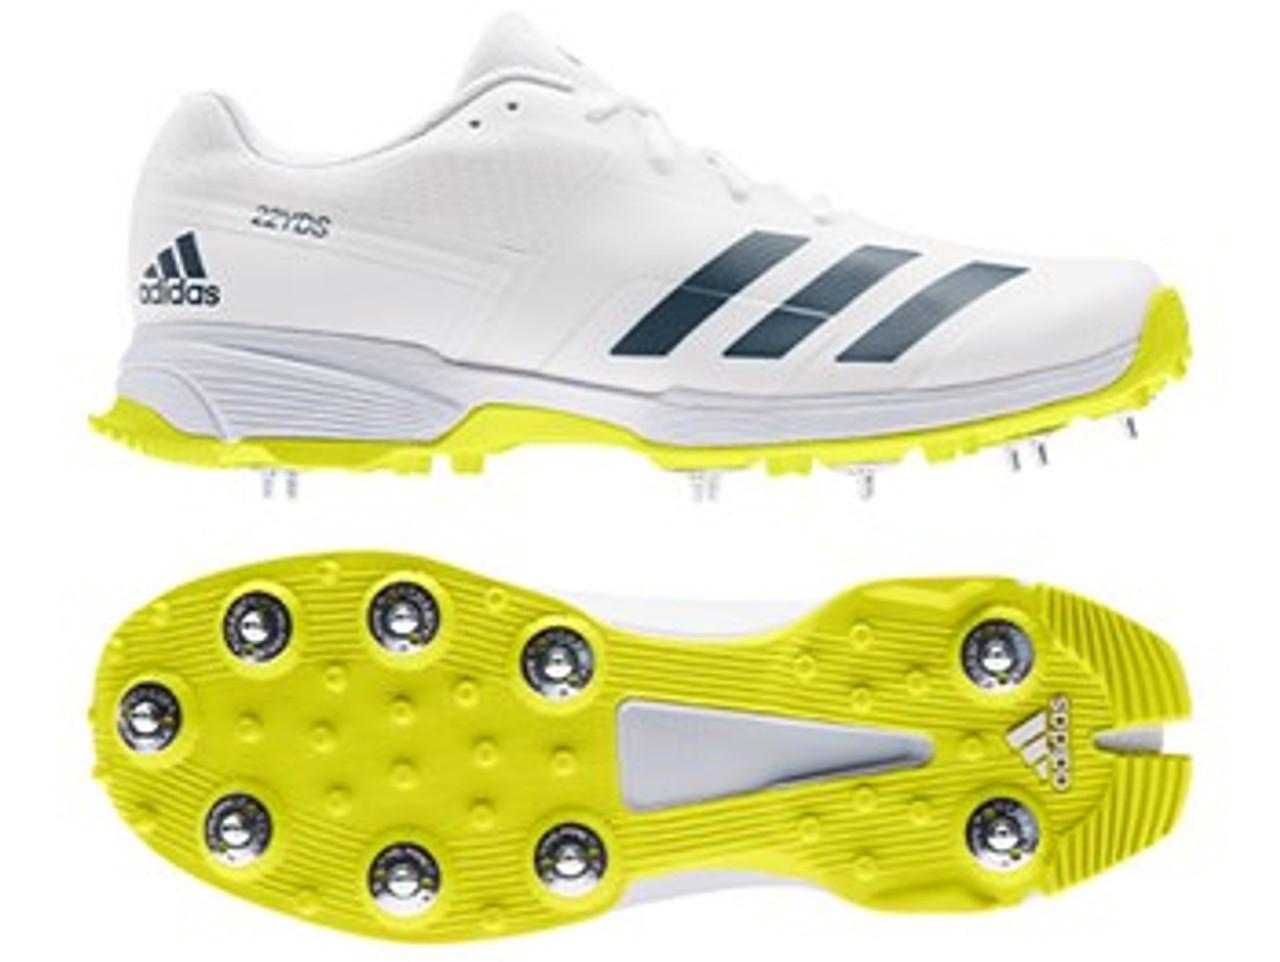 Adidas 22YDS Cricket Shoes 2021